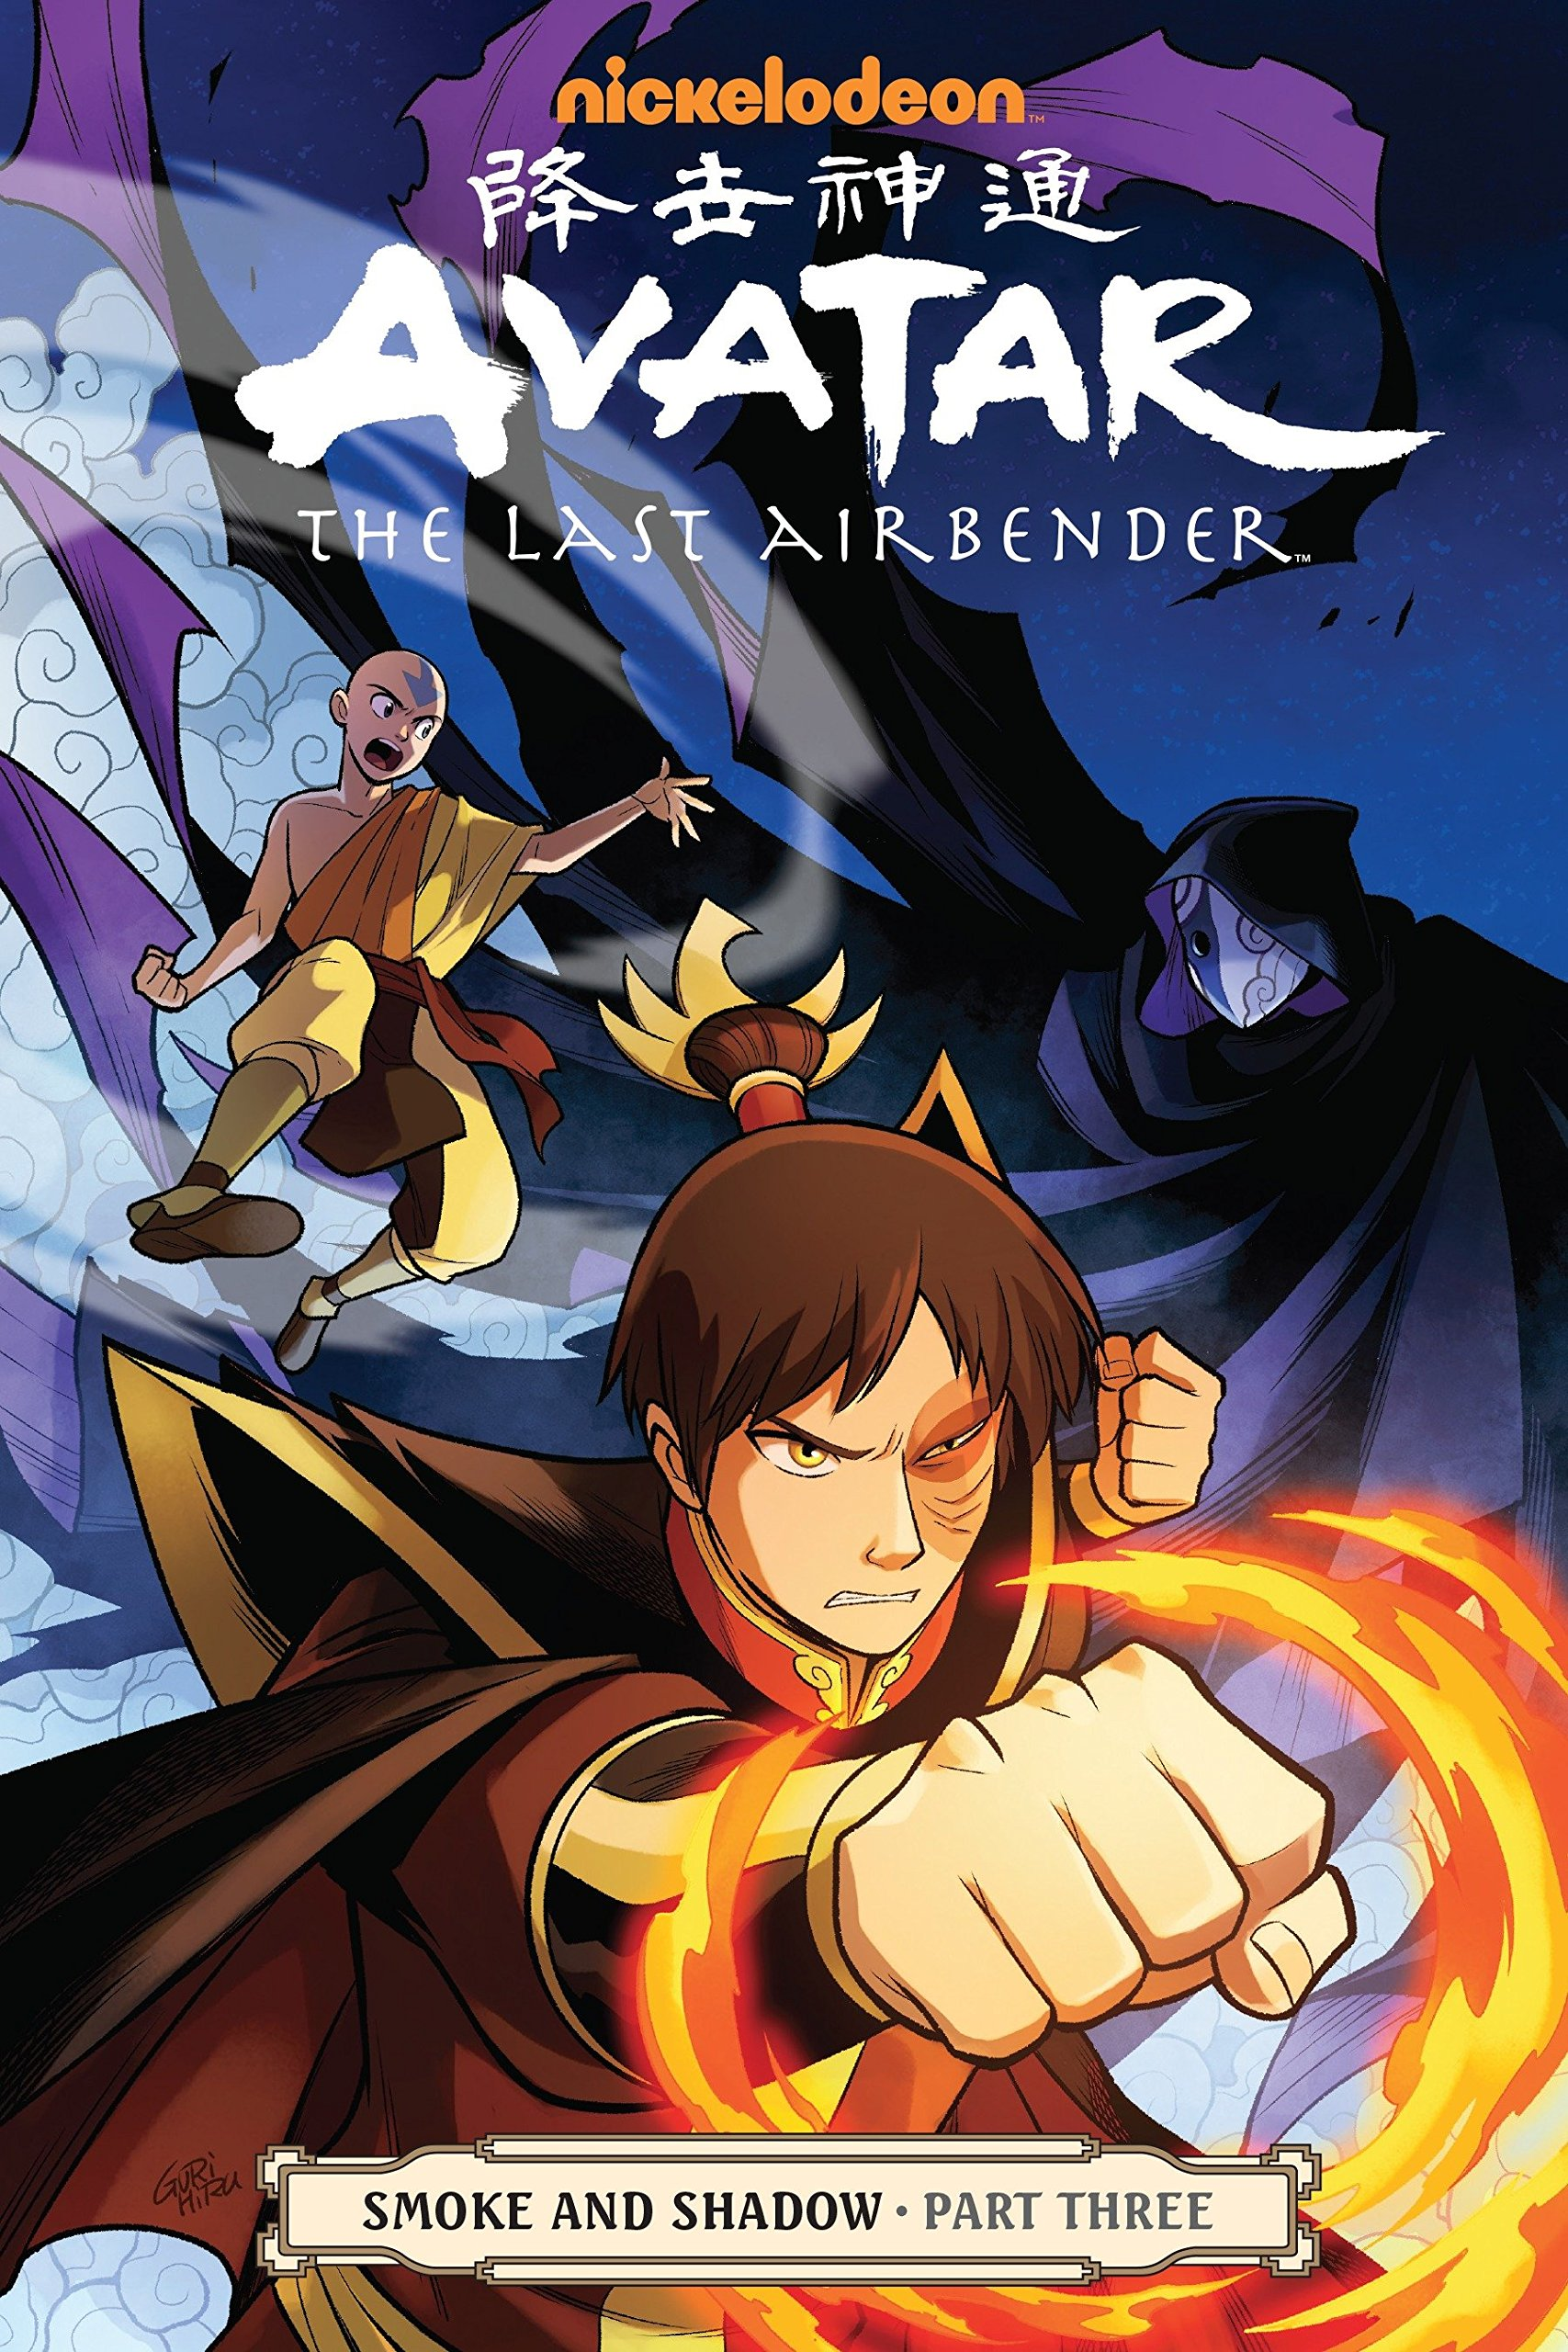 Avatar the Last Airbender 3: Smoke and Shadow (Inglese) Copertina flessibile – 14 apr 2016 Gene Luen Yang Gurihiru Michael Heisler Dark Horse Comics